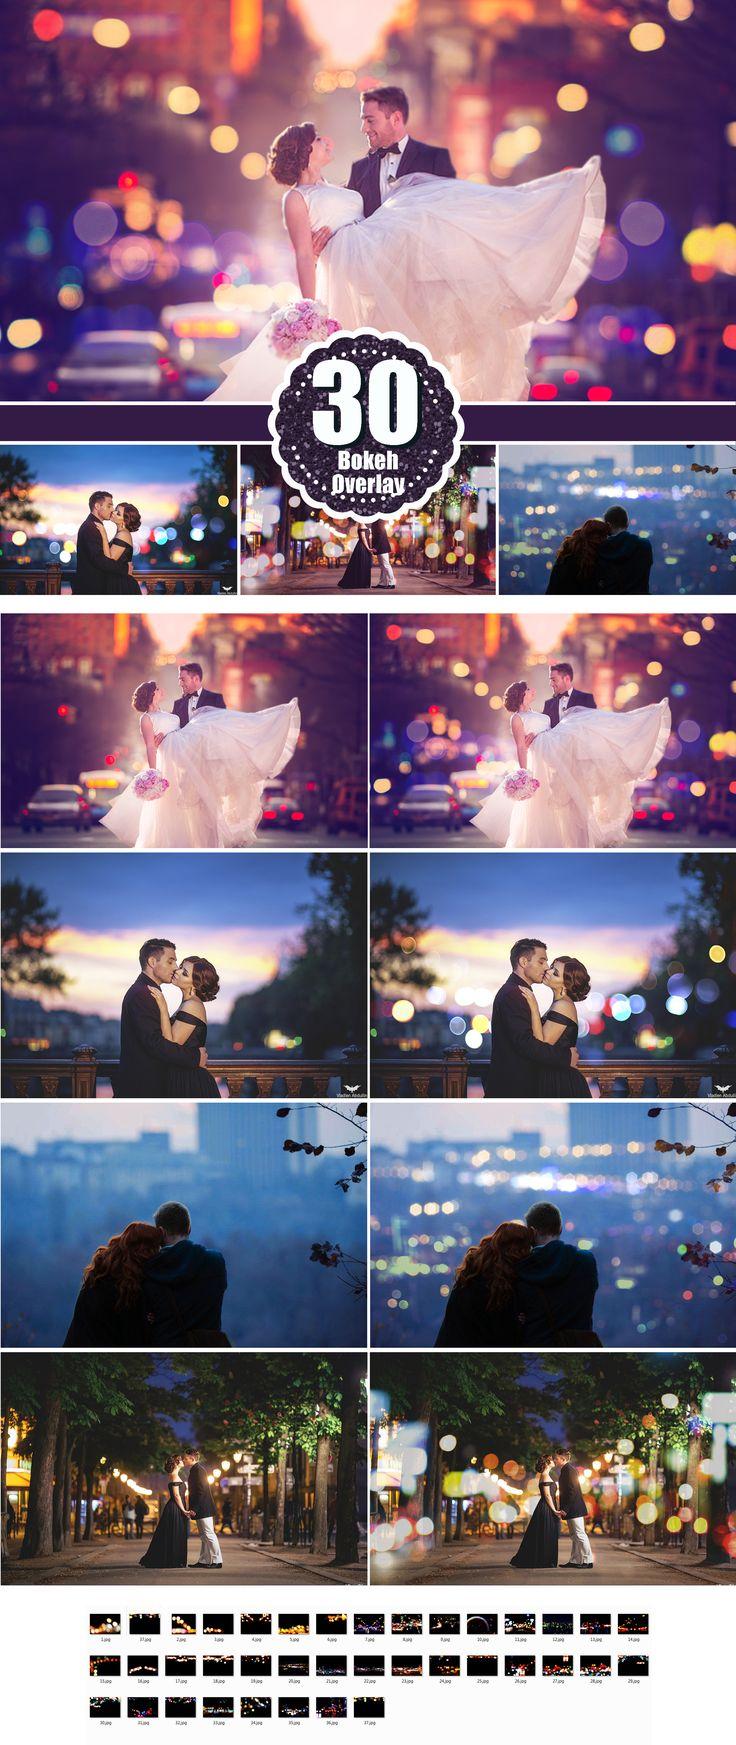 City Bokeh Light Overlays, Digital Backdrop, Holiday Party Wedding Lights, Overlays Photoshop, Digital Background